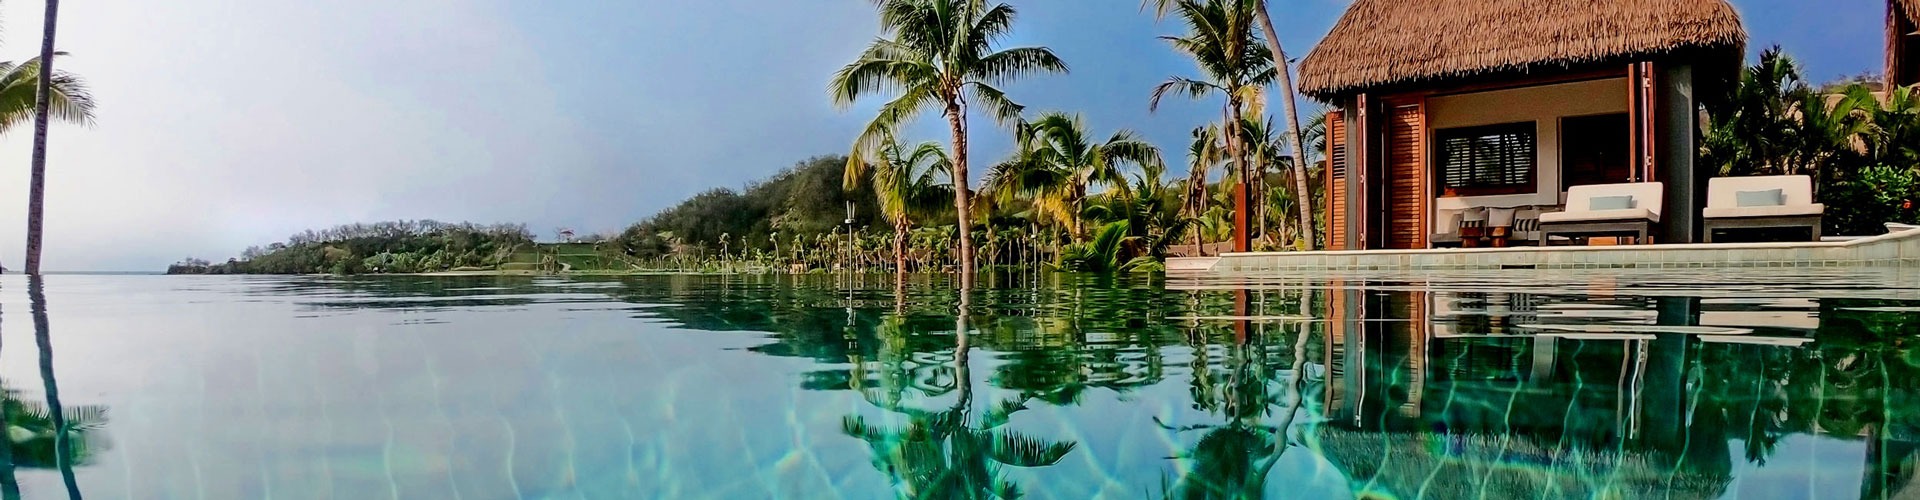 WIVC Magic Tree Resort